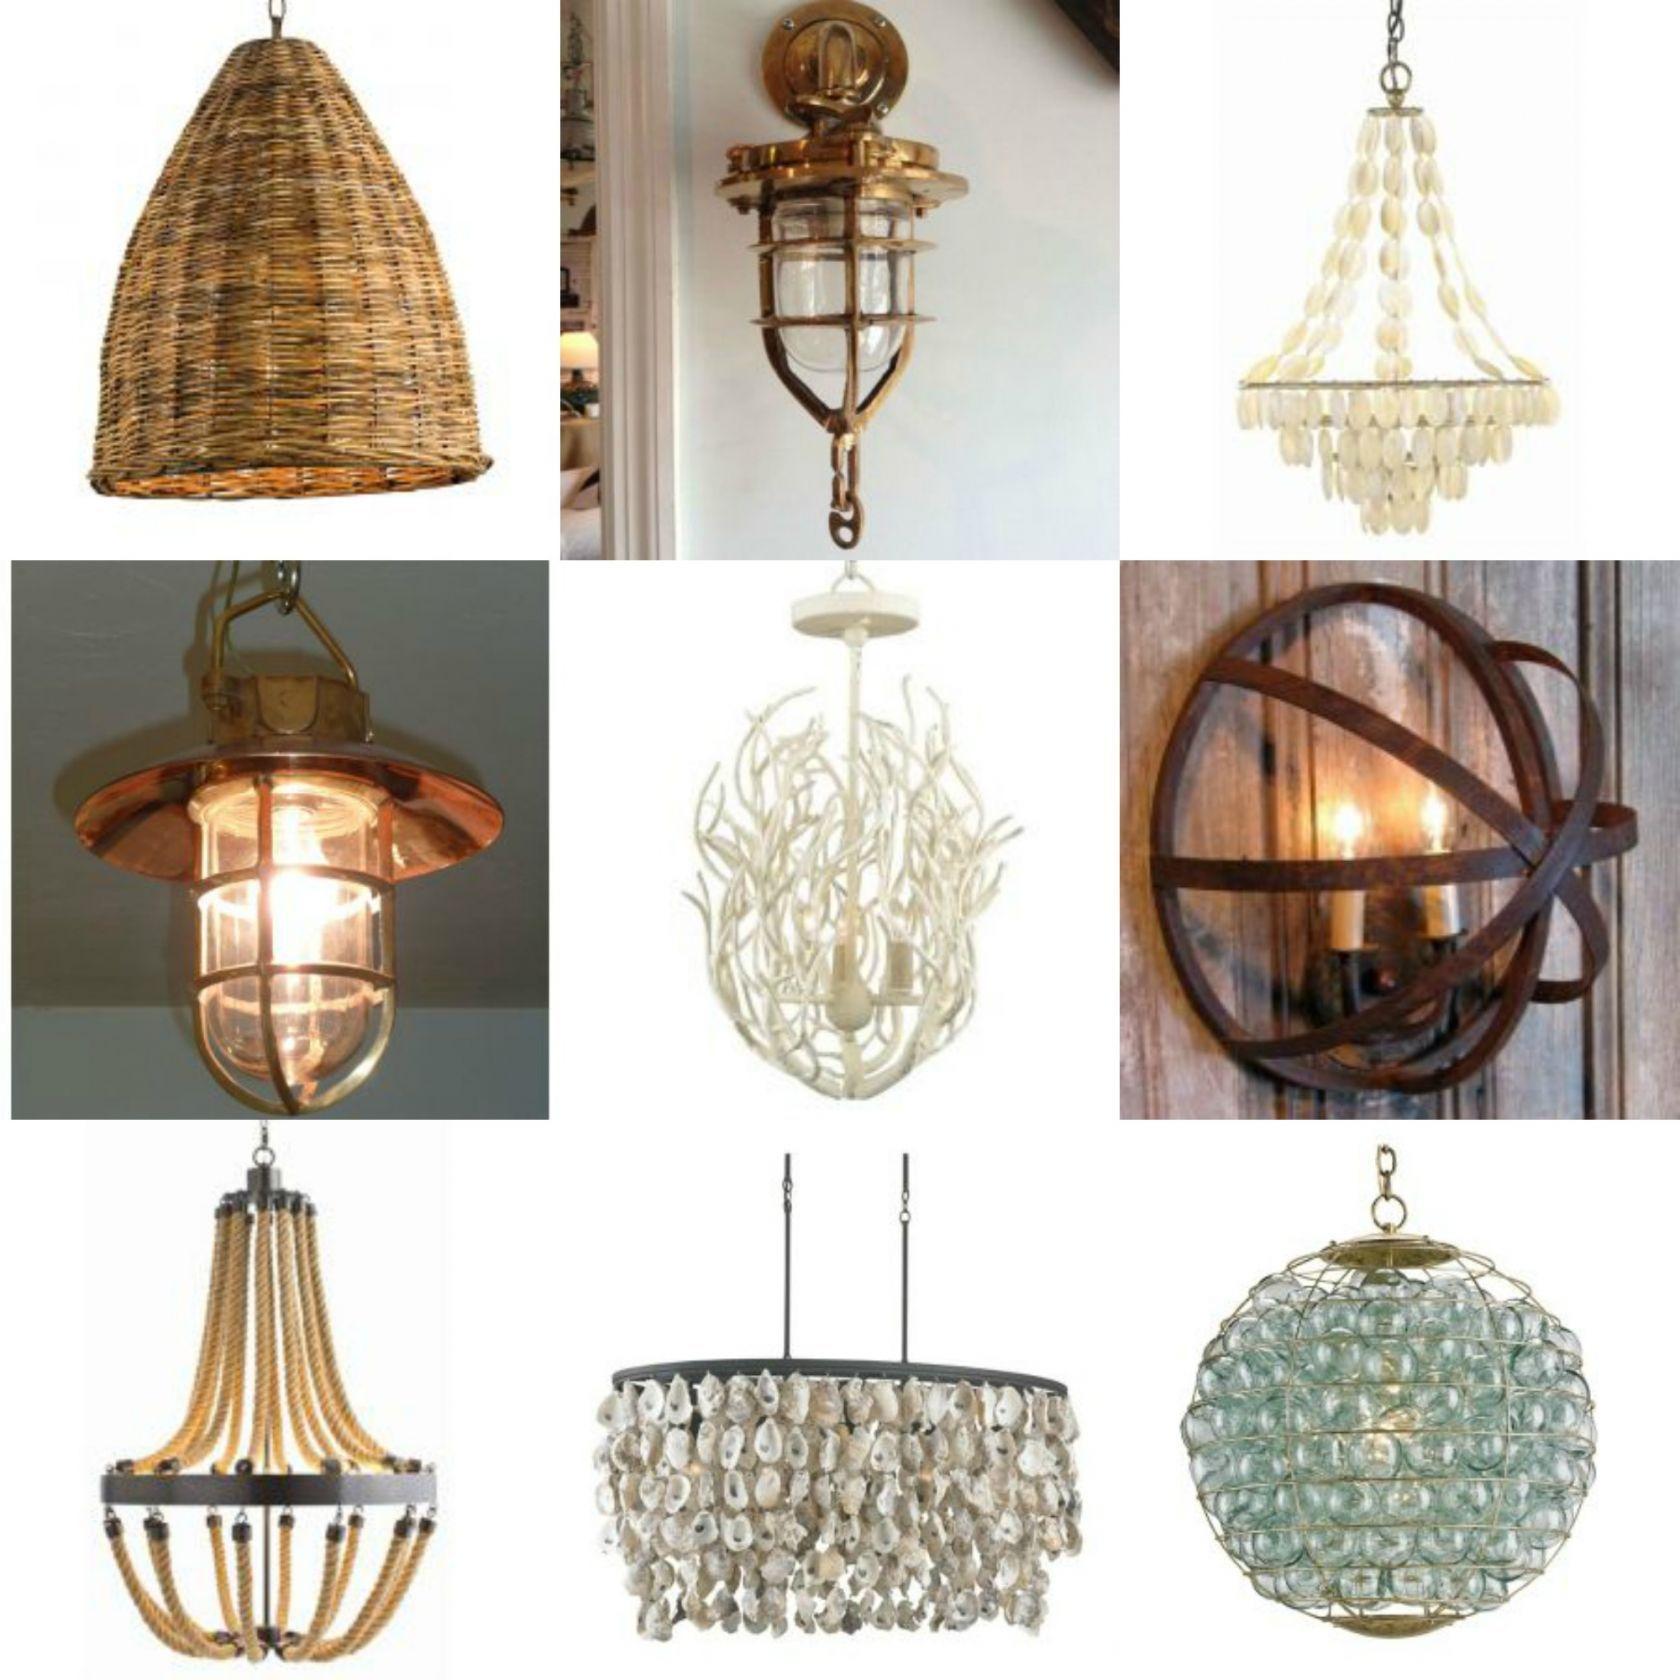 Our Boat House Coastal Lighting Designer Tips Pinterest